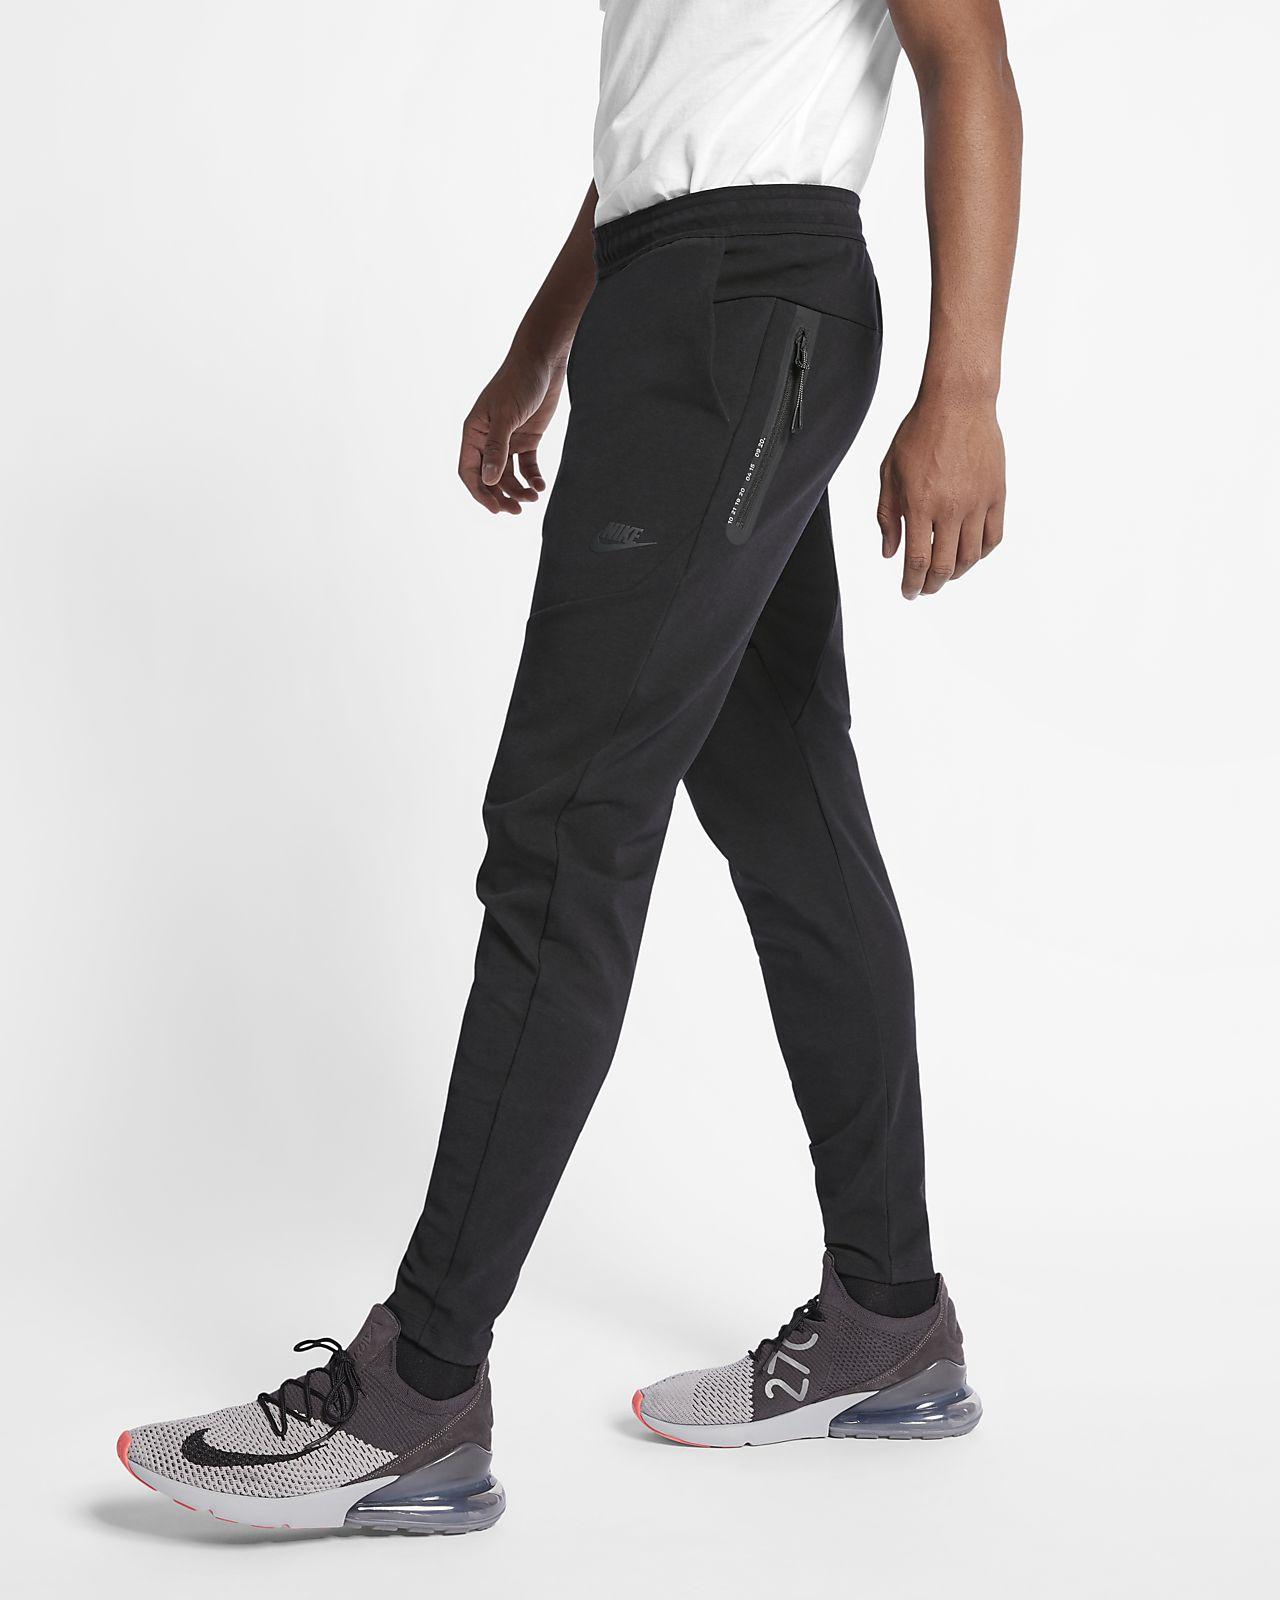 f674c5f1c2 Nike Sportswear Tech Pack Men's Trousers. Nike.com CH